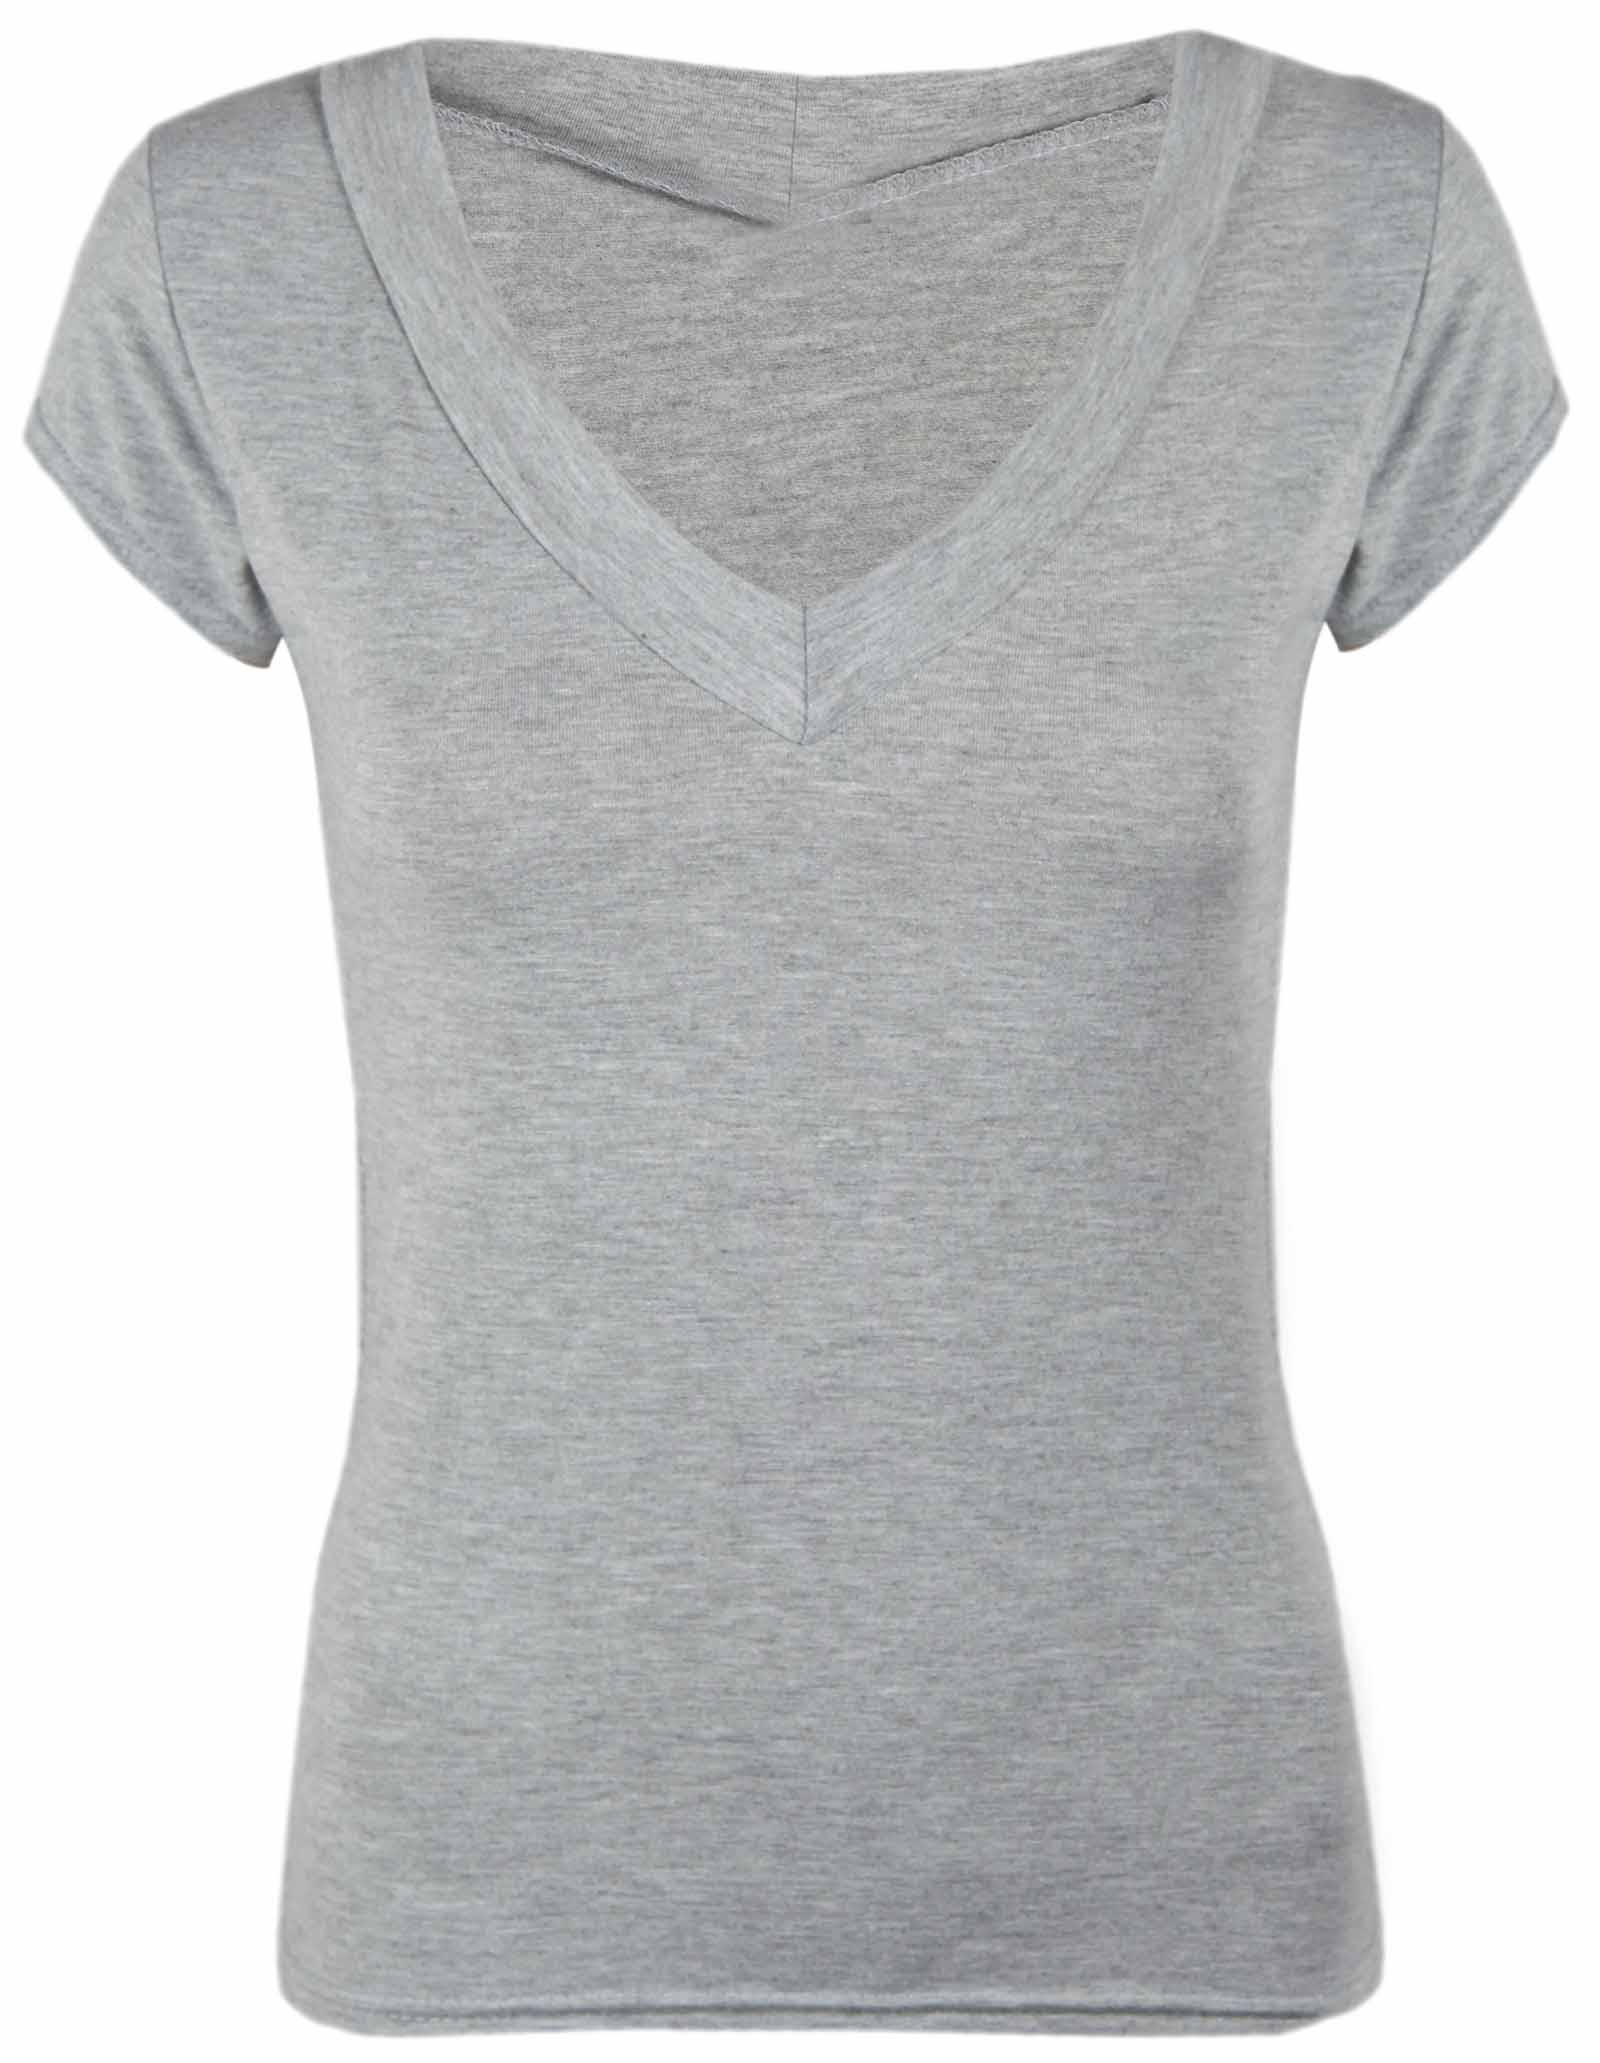 Basic V Neck Plain T-Shirts